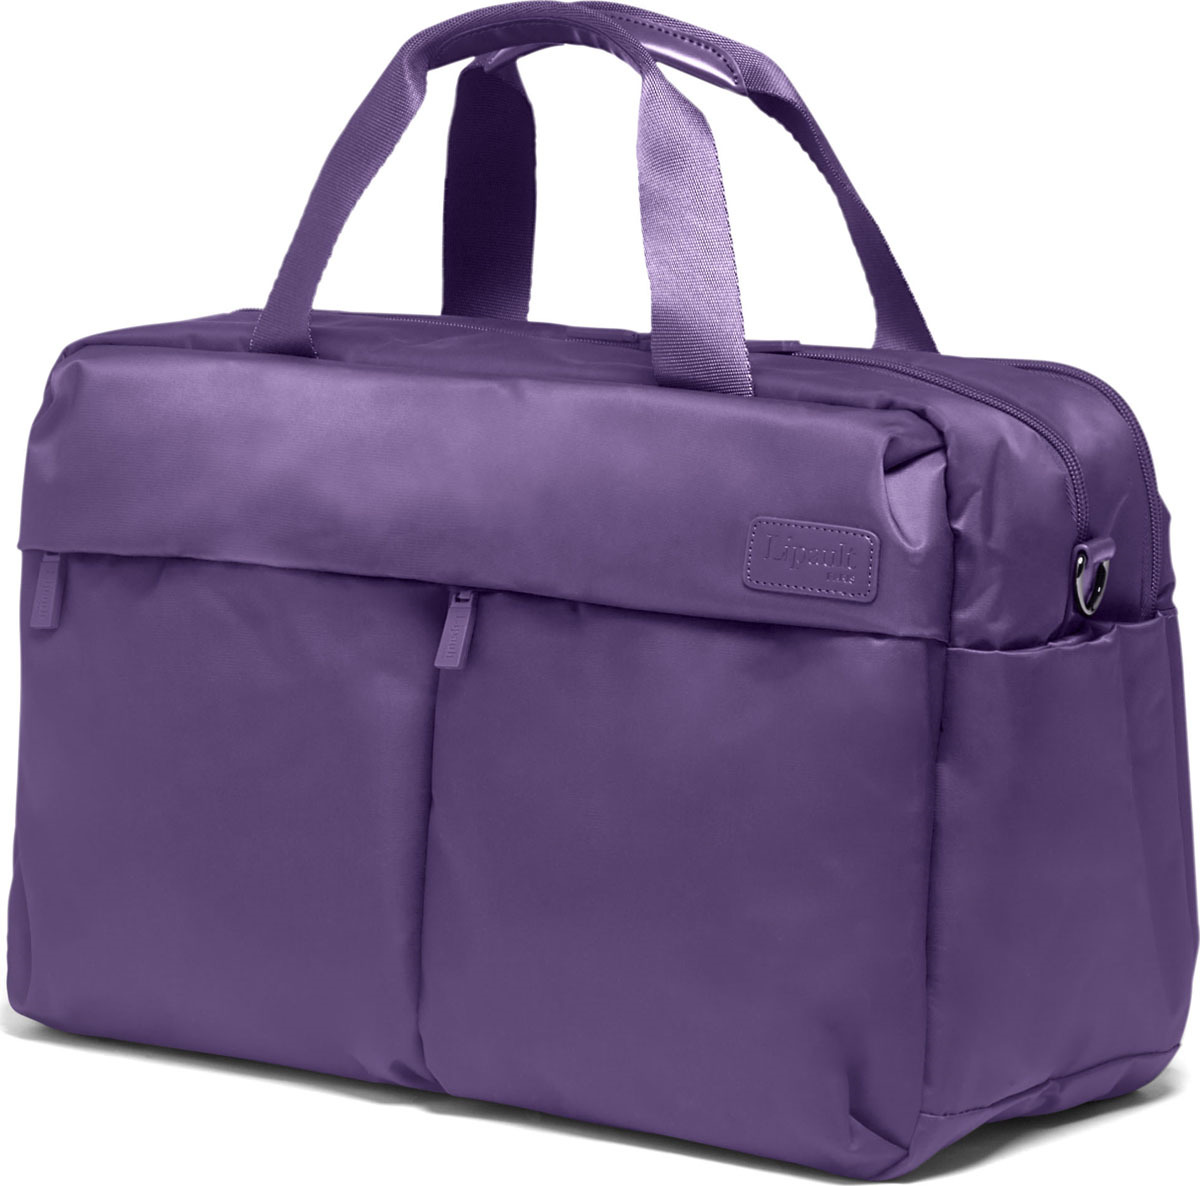 Сумка дорожная Lipault, P61*A0007, фиолетовый, 27 л цена и фото